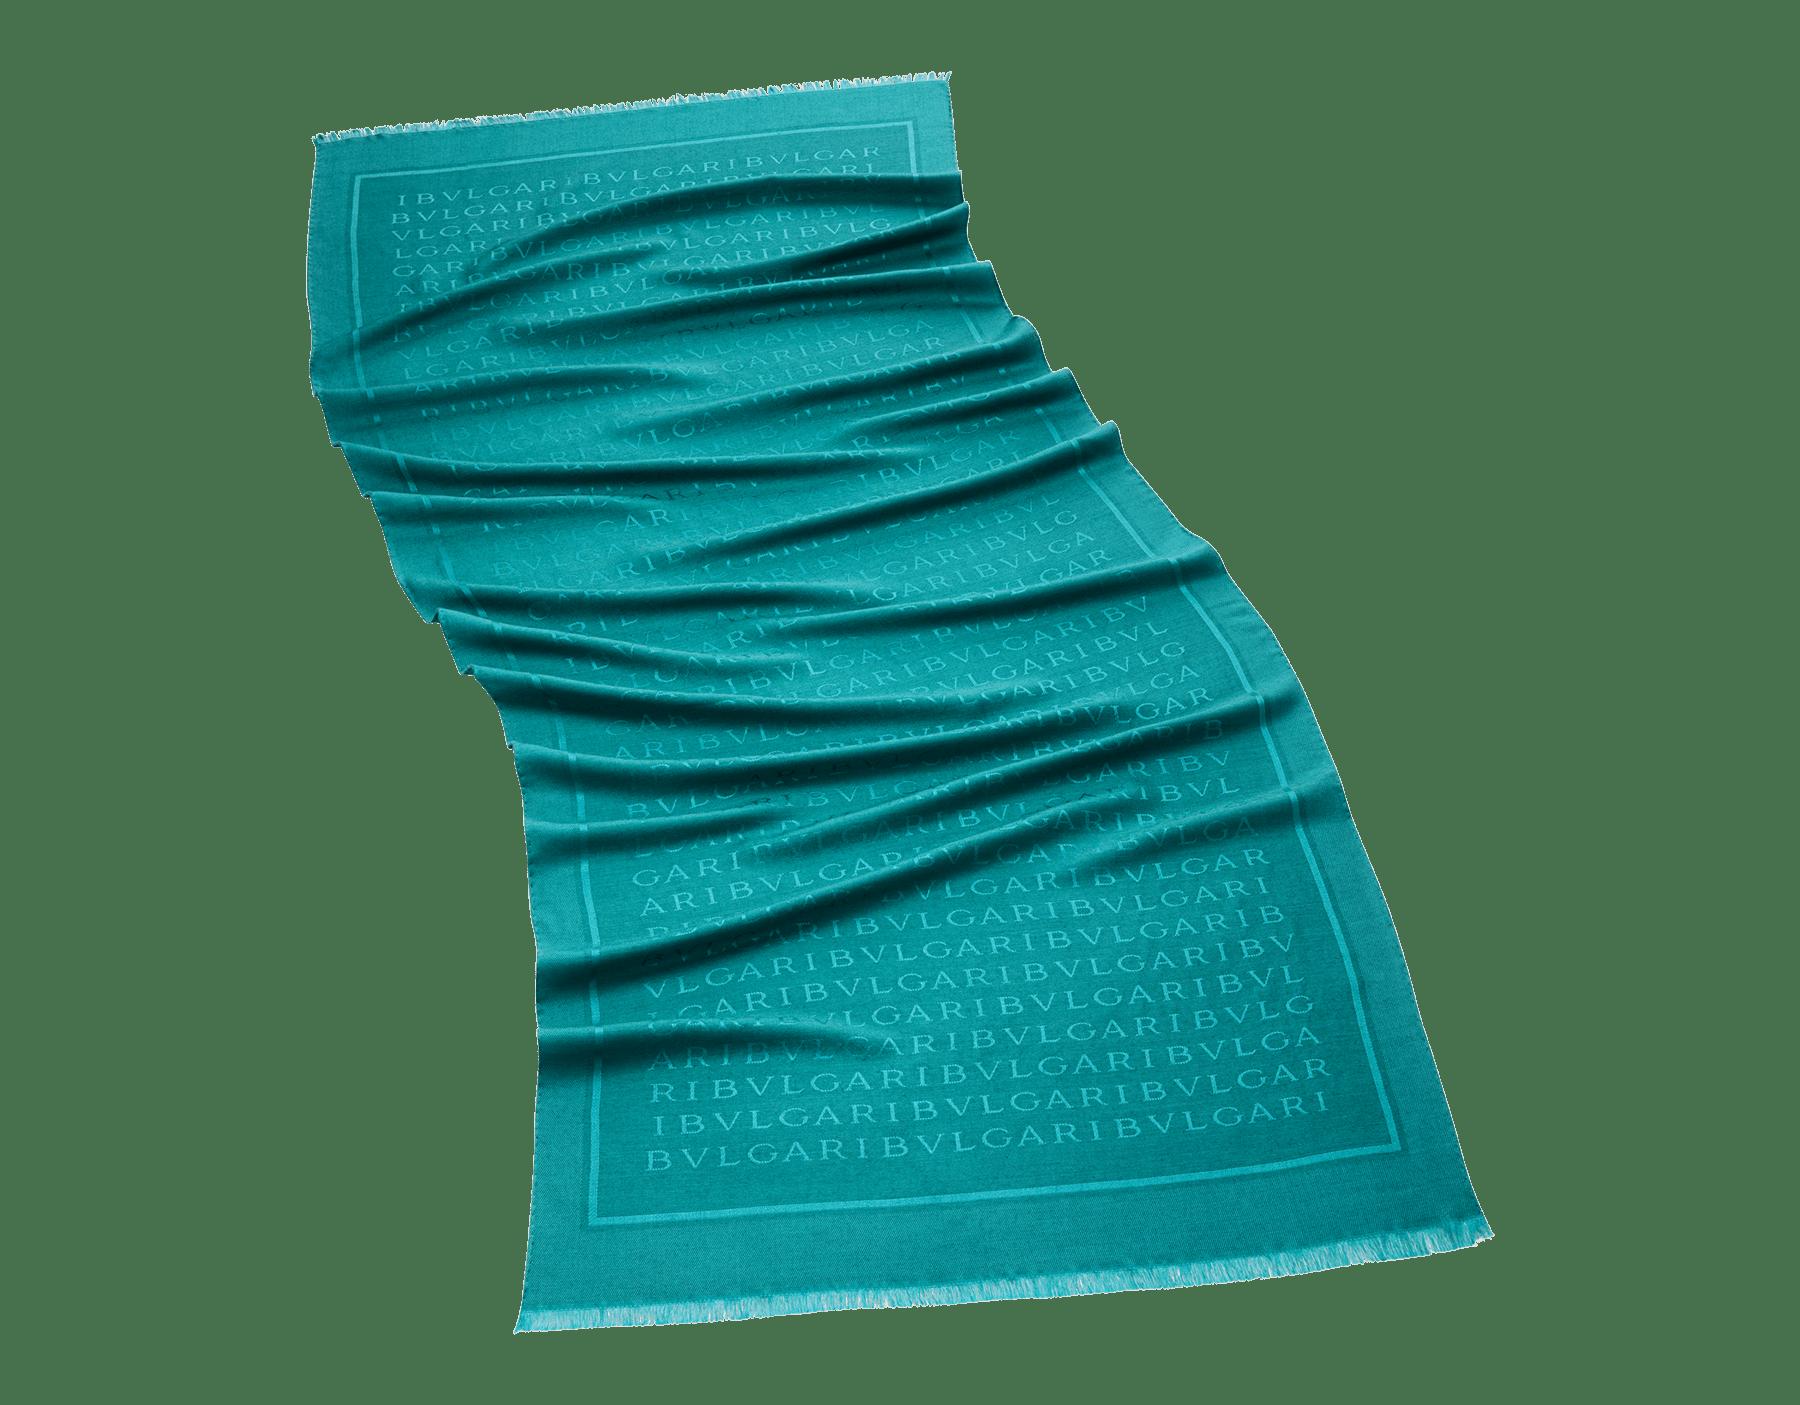 Turmalinfarbene Lettere Maxi Stola aus feiner Seide und Wolle. LETTEREMAXIb image 1